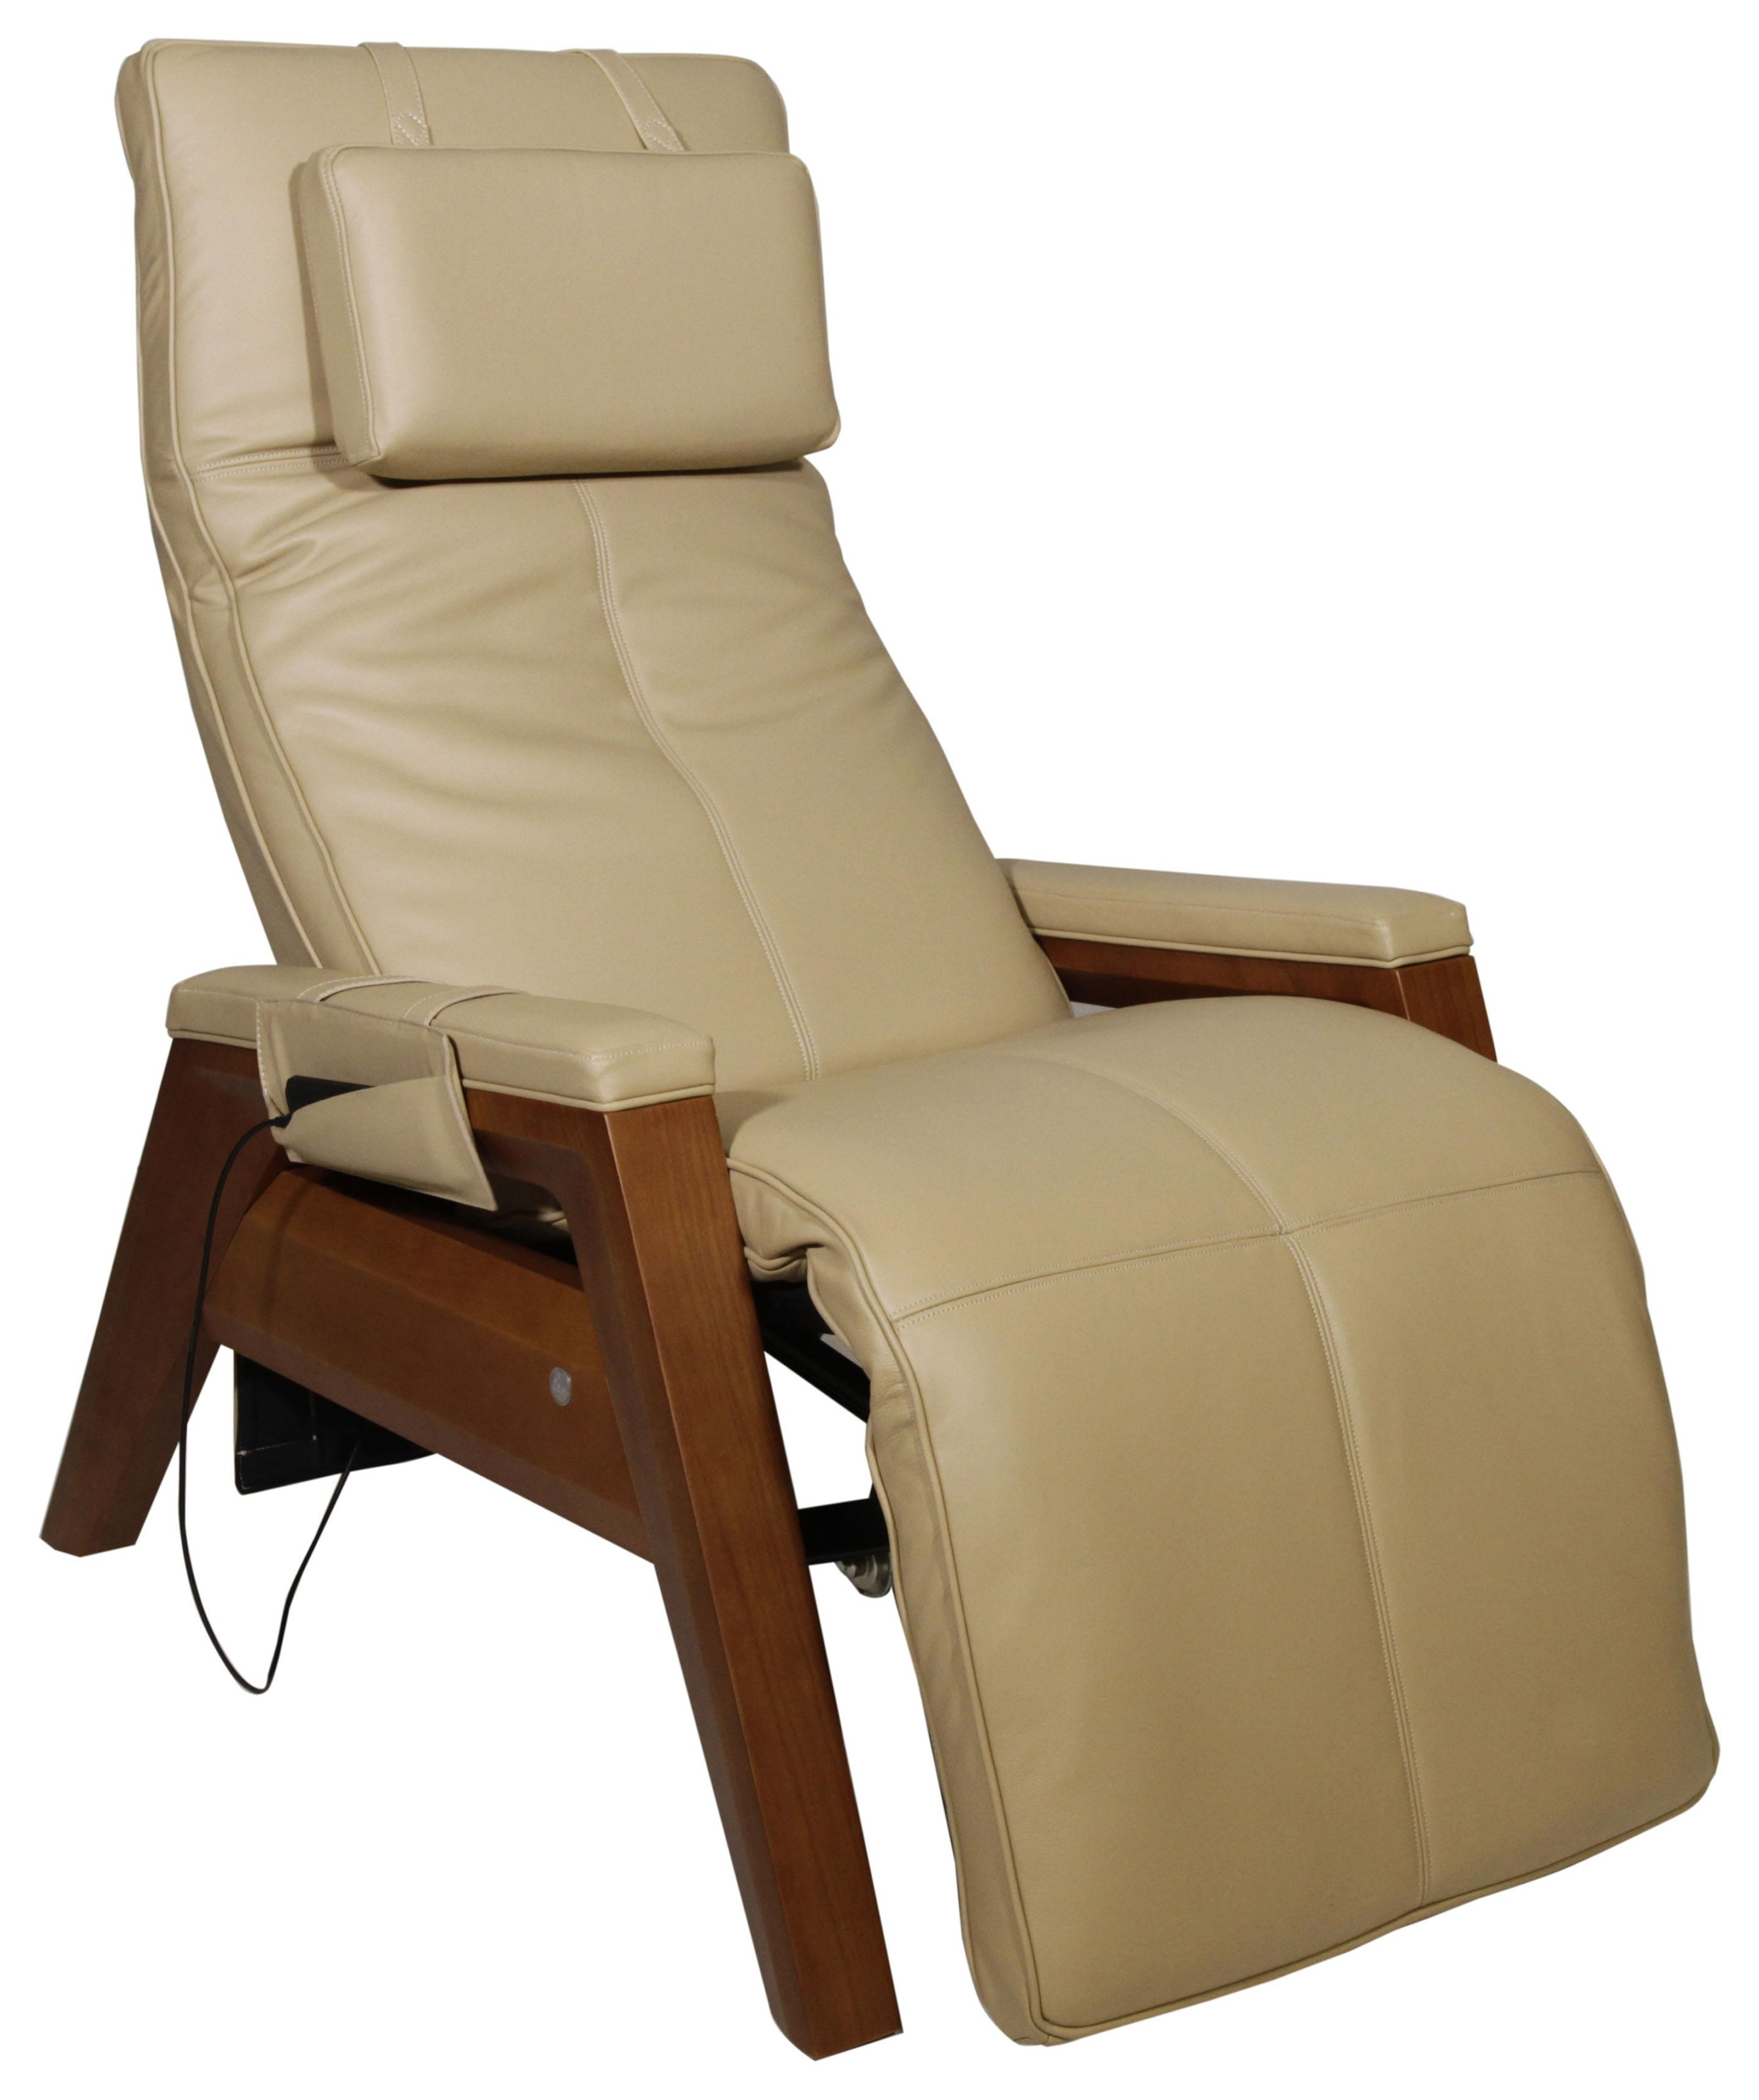 Gravis Zero Gravity Chair by Human Touch at HomeWorld Furniture